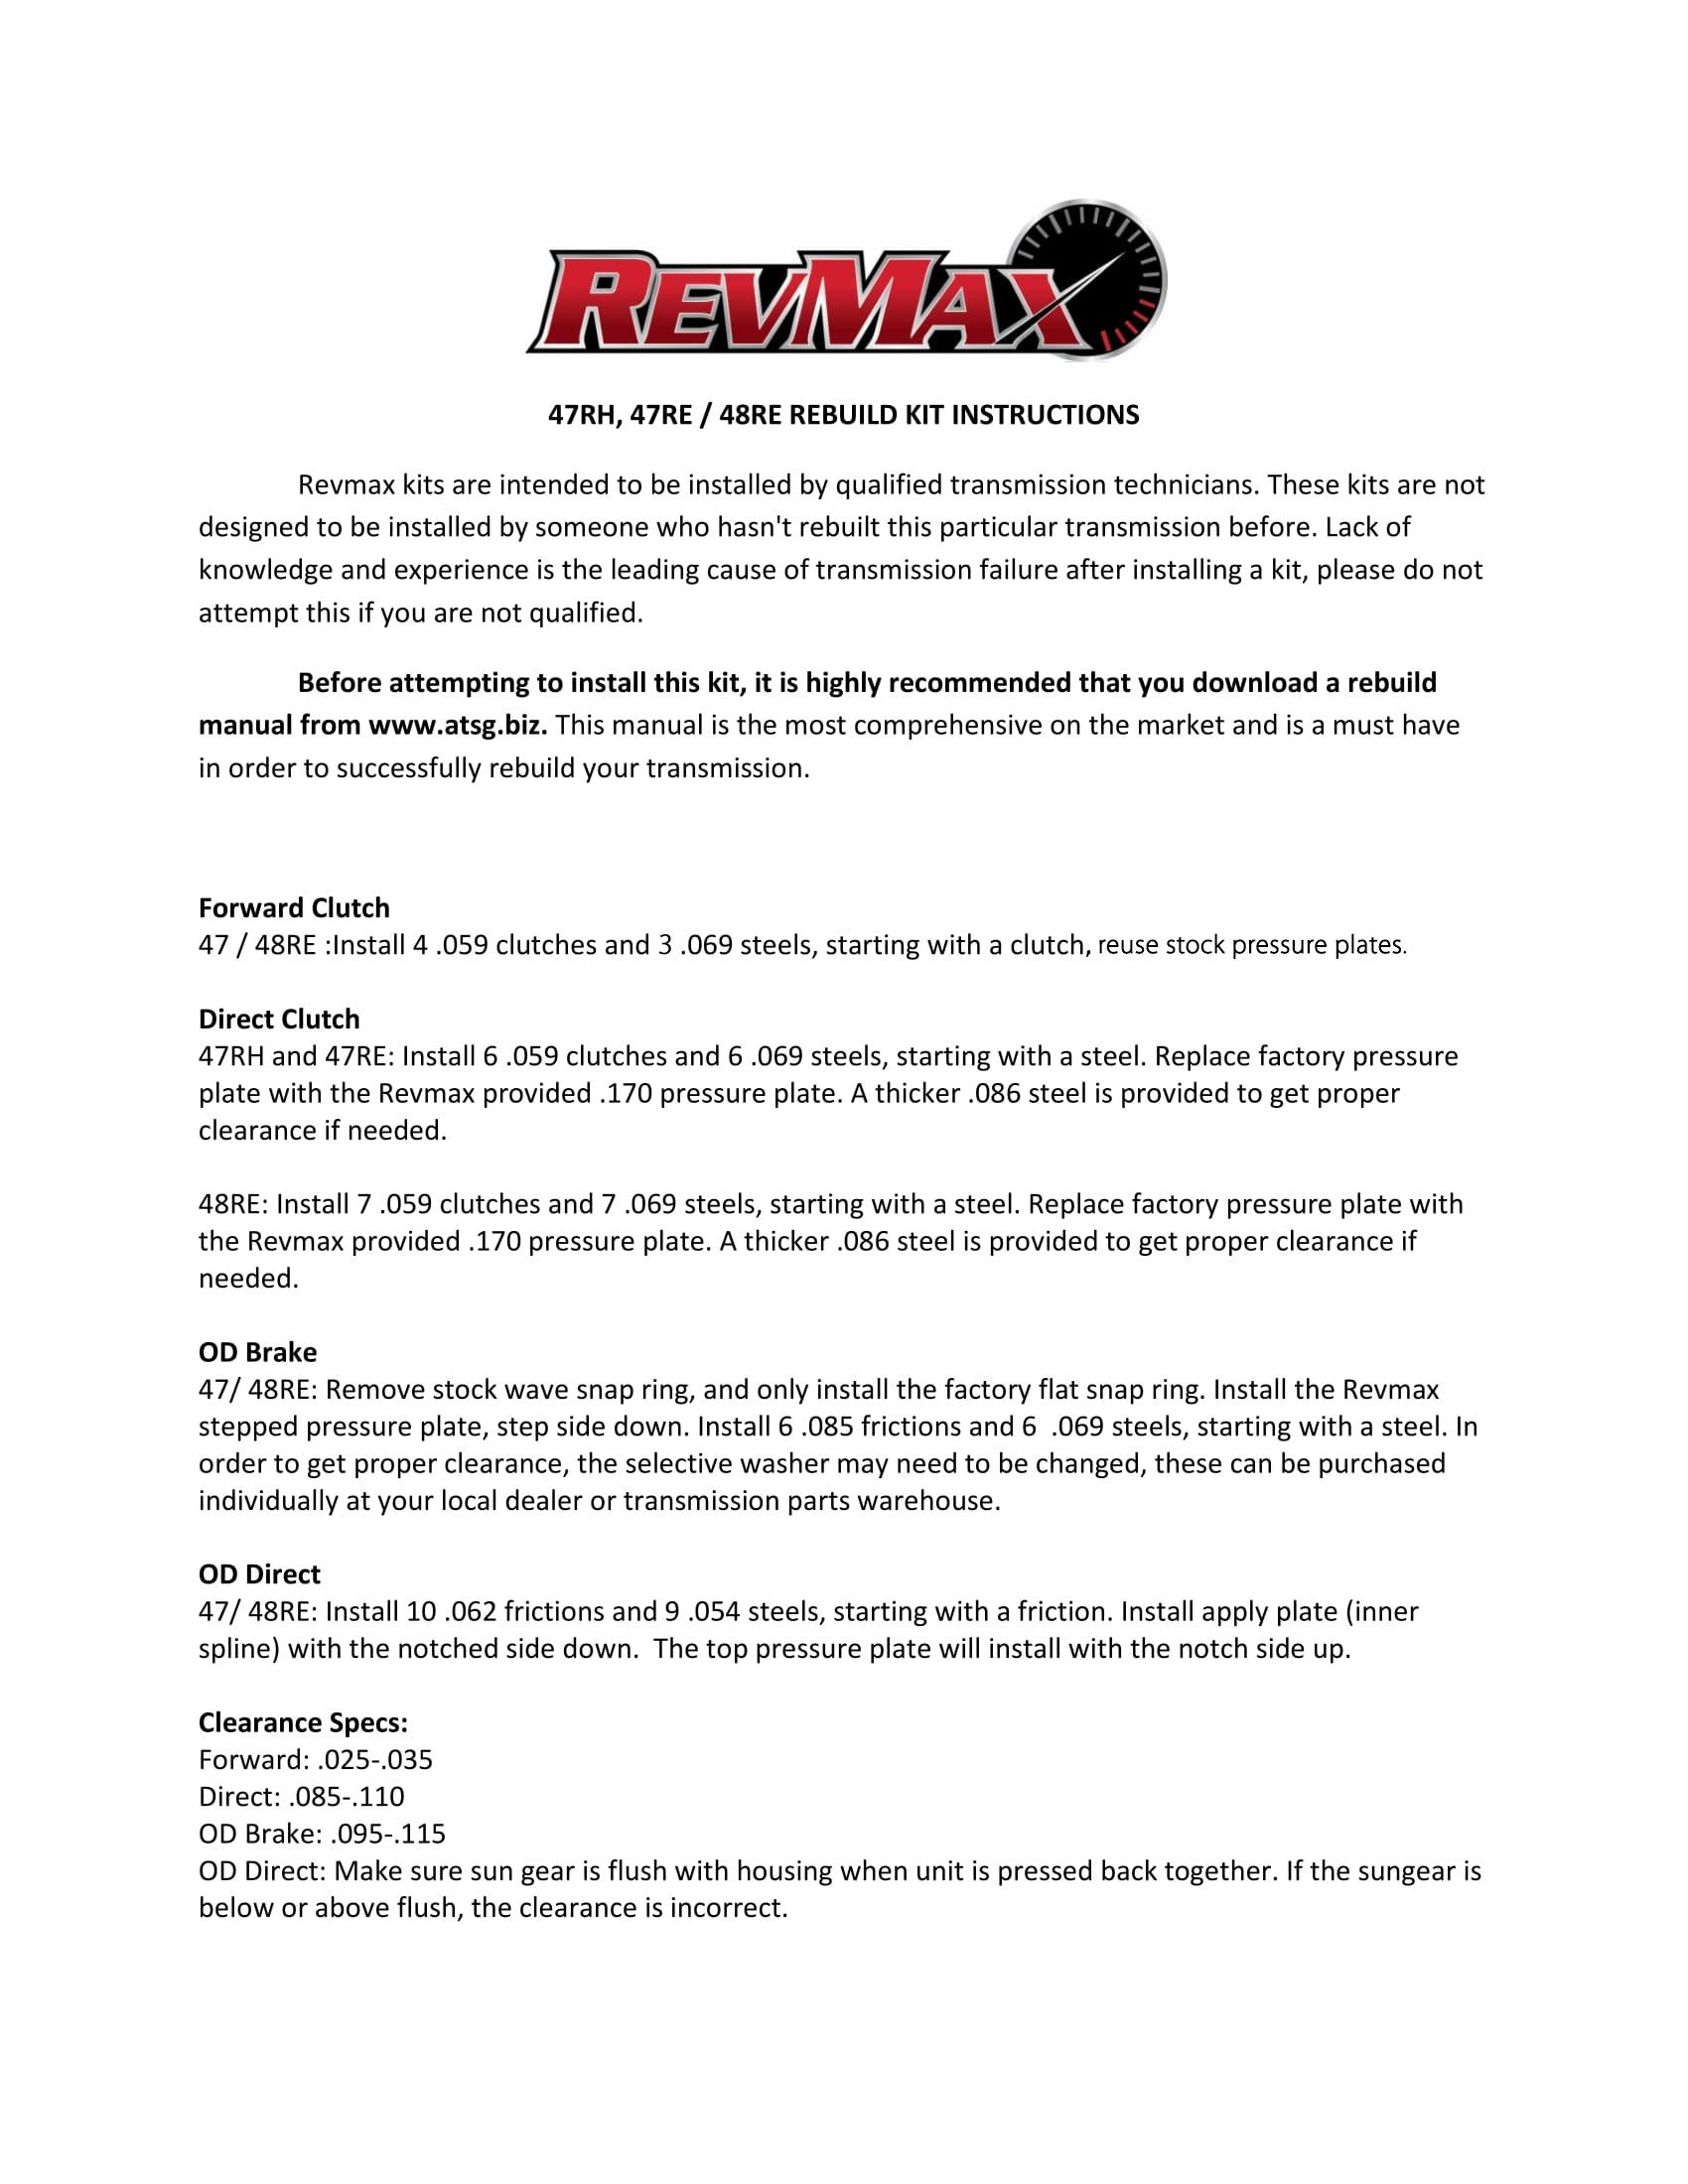 47rh Manual 48re Throttle Valve Actuator Wiring Diagram Body Rh Muldoonsdiesel Com Array Logoutev De